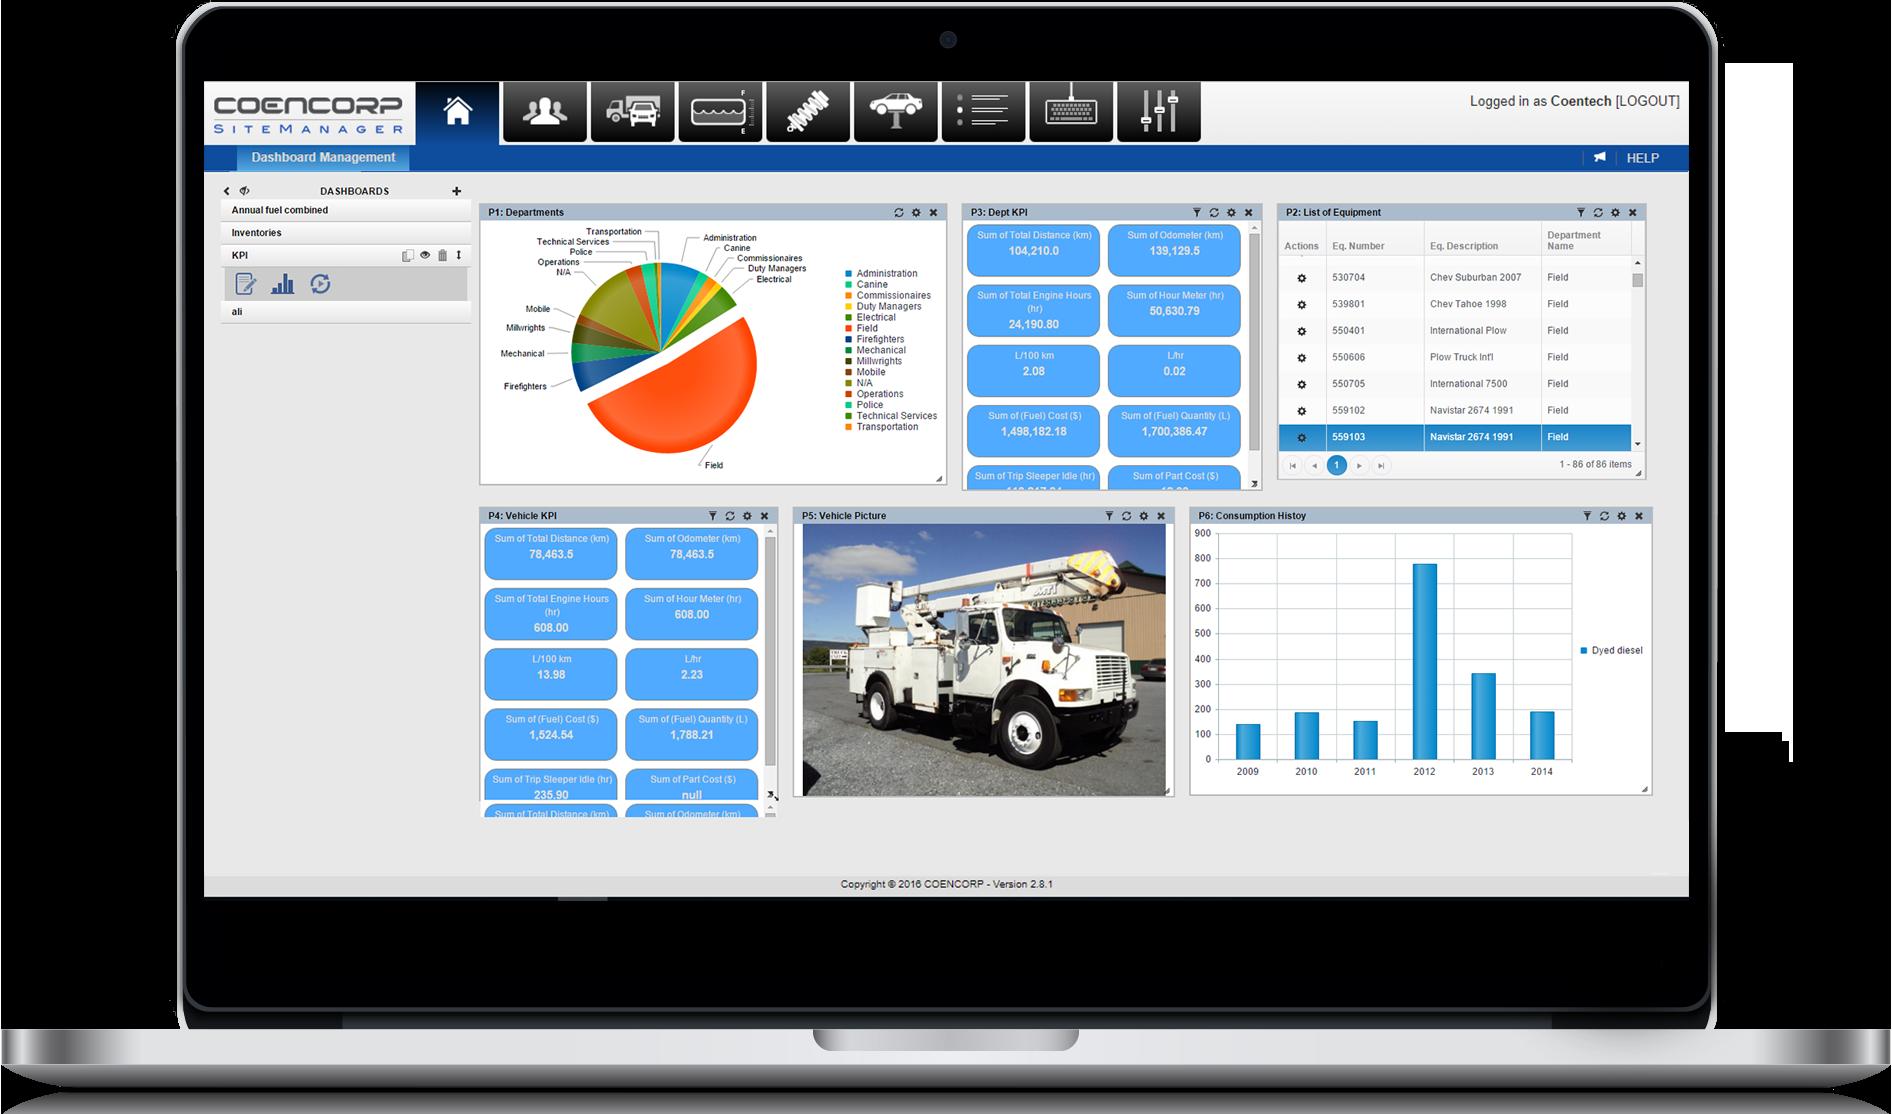 laptop-access control dashboard temp